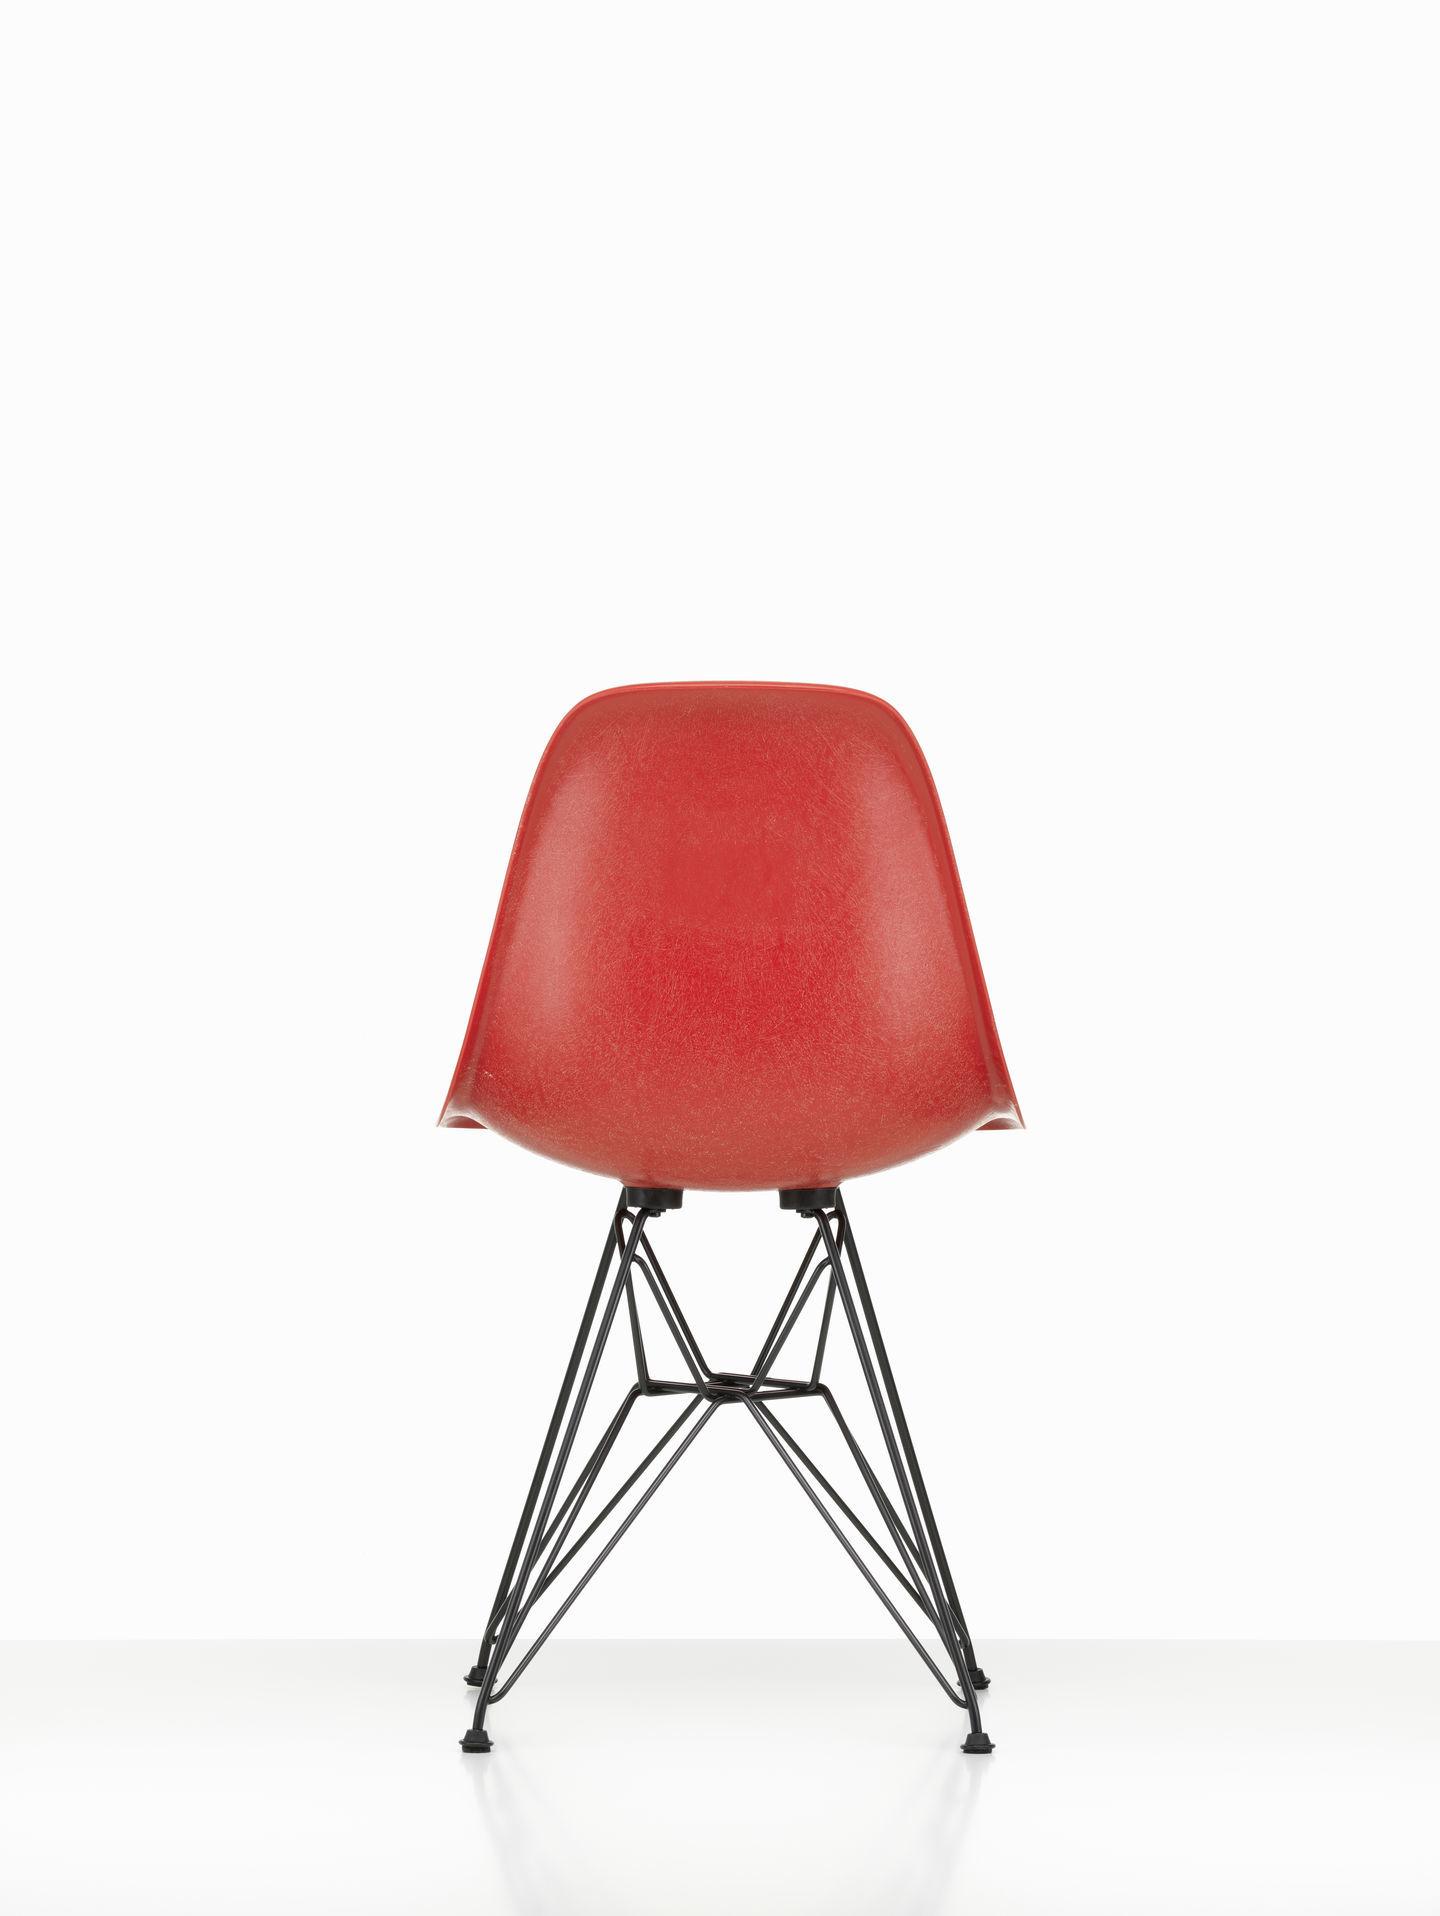 Eames Fiberglass Chair DSR Stuhl Vitra Farben 2019